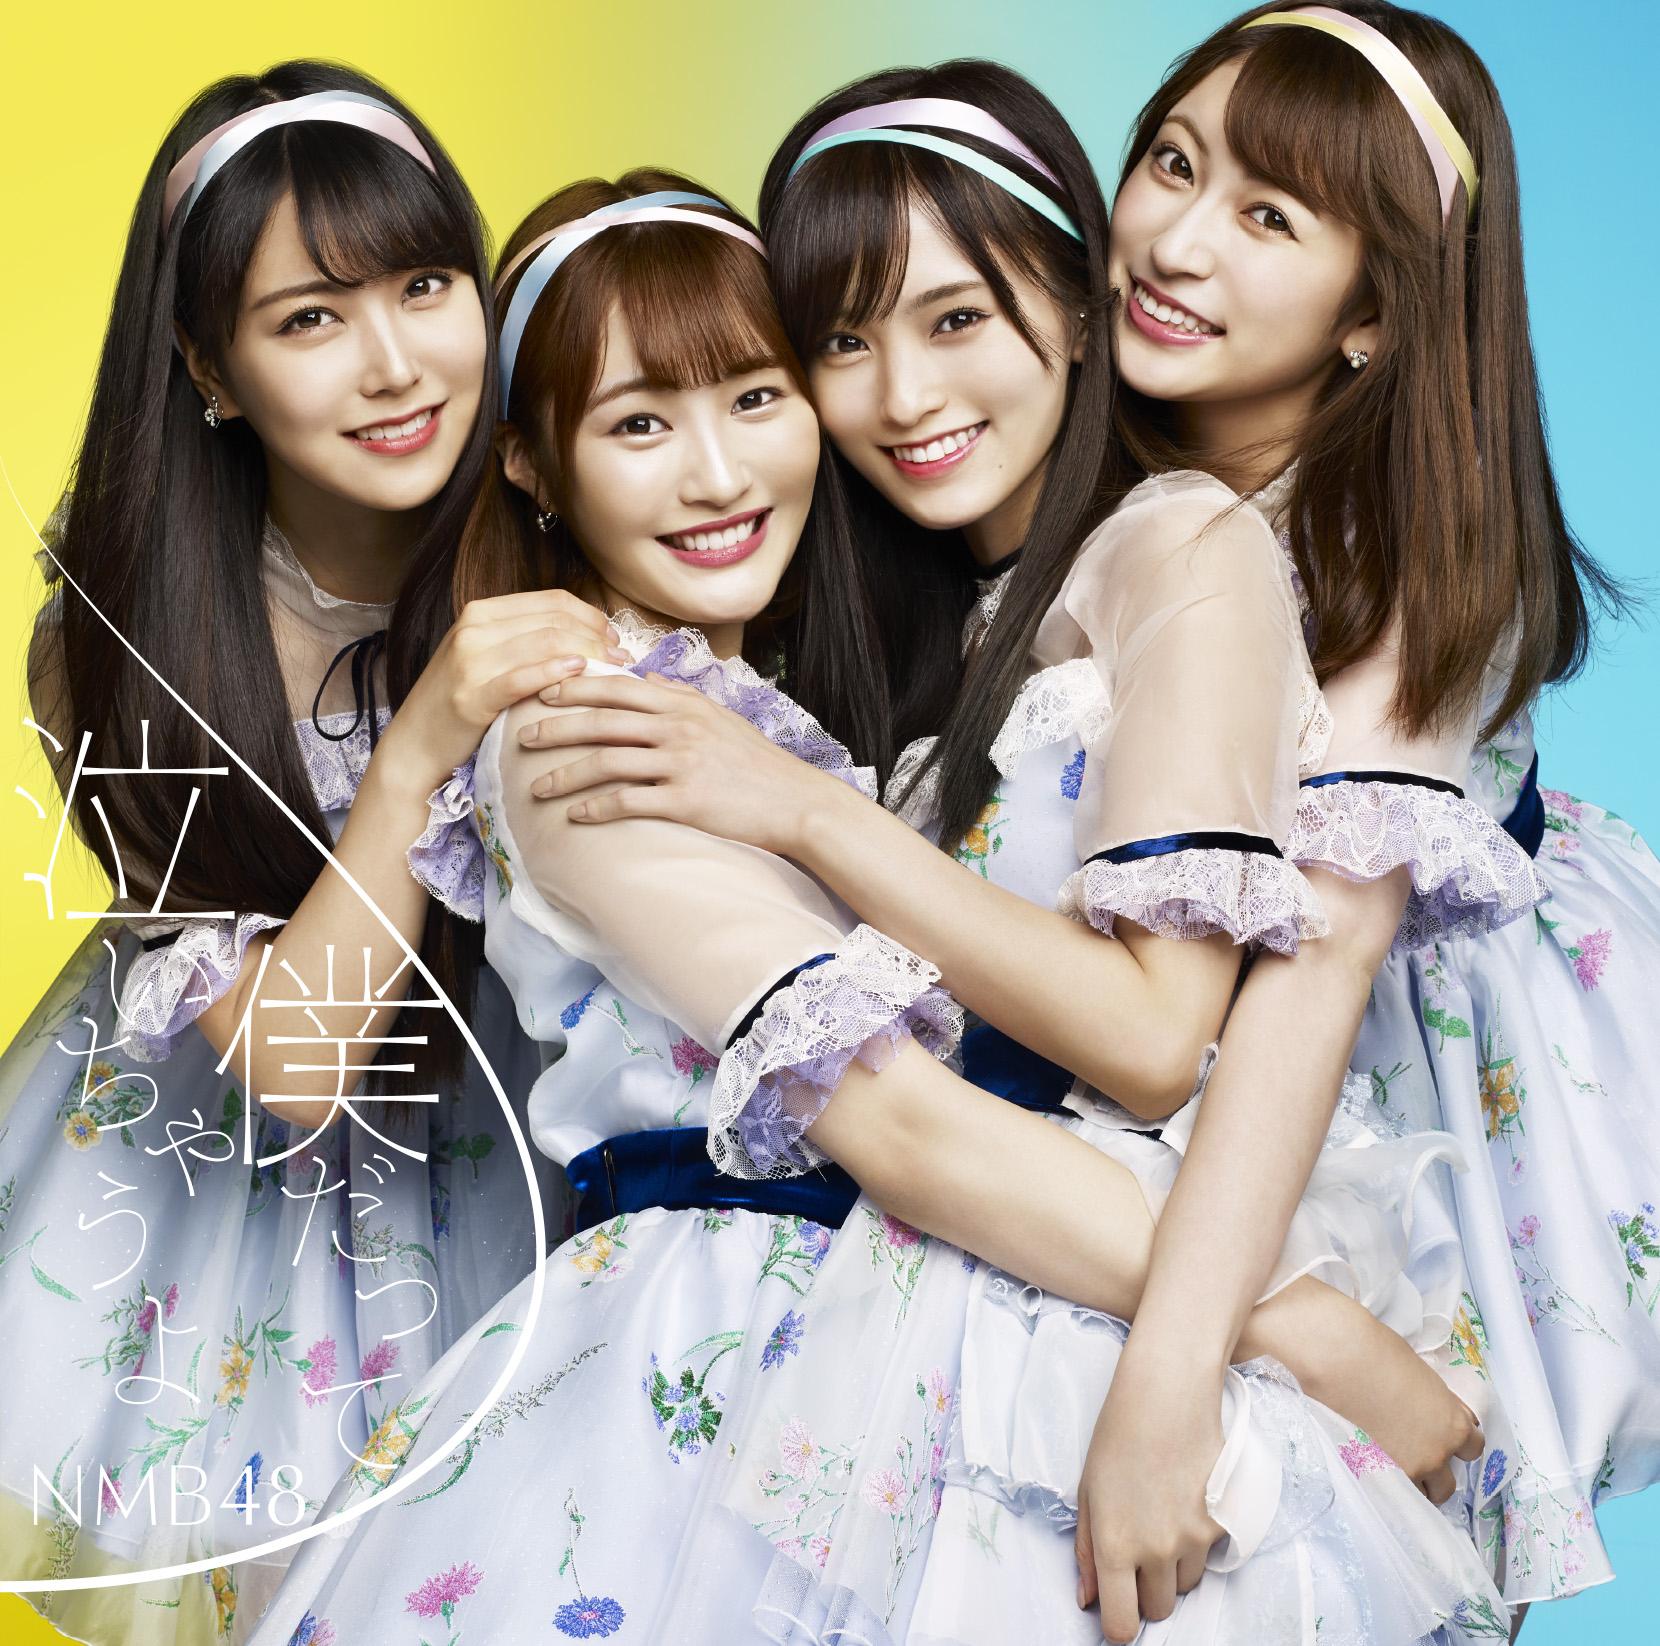 CD】NMB48 19thシングル「僕だって泣いちゃうよ」Type-B【初回限定盤 ...